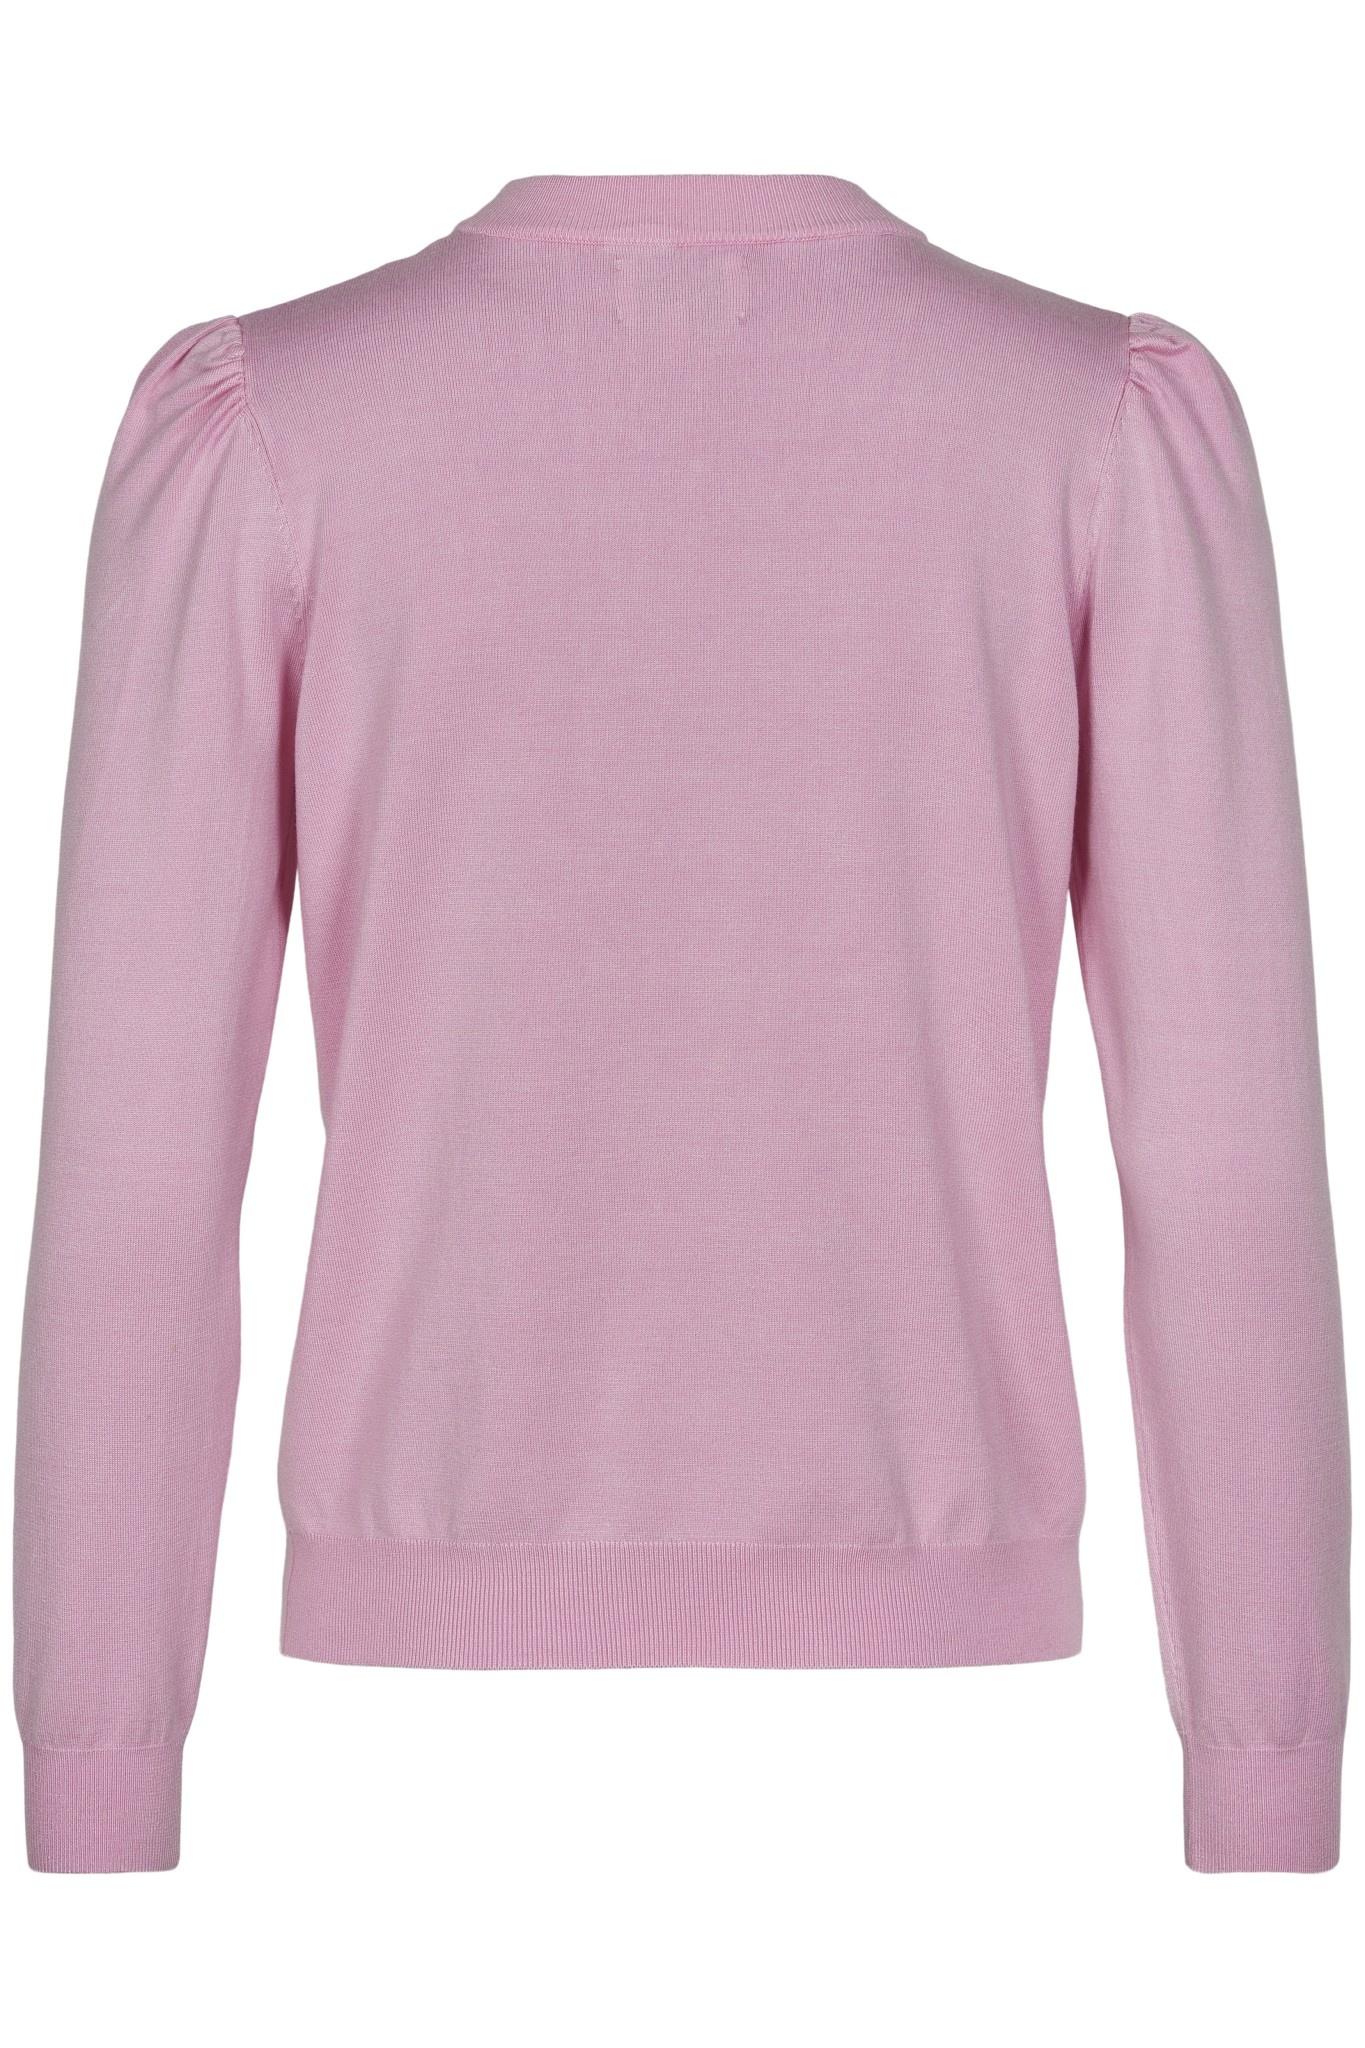 Nümph Baojin pullover - Roze